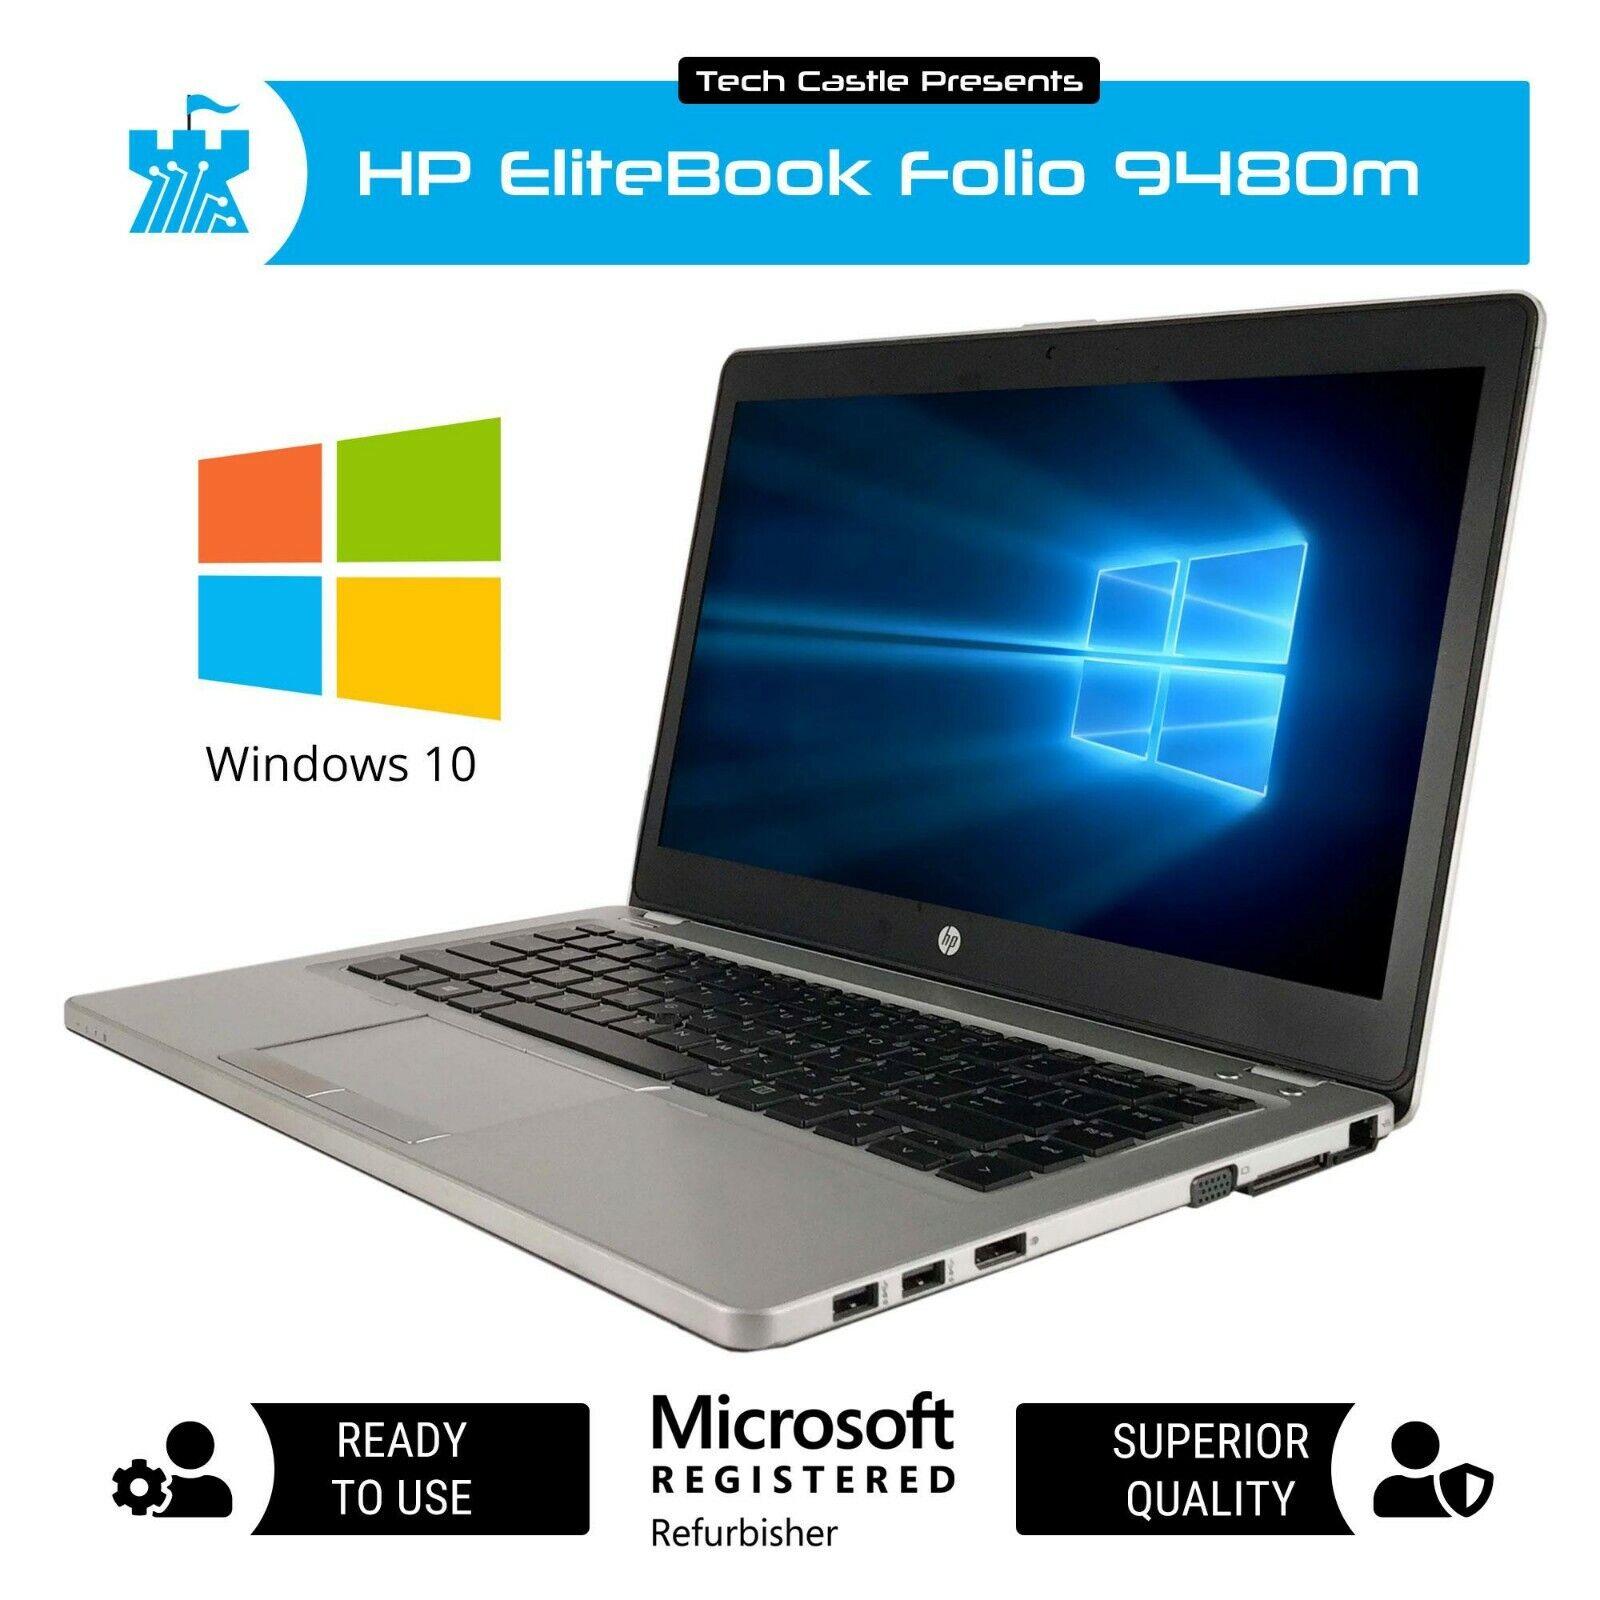 Laptop Windows - HP Laptop Computer Windows 10 Pro FAST Intel i7 8GB RAM 256GB SSD HD WEBCAM PC